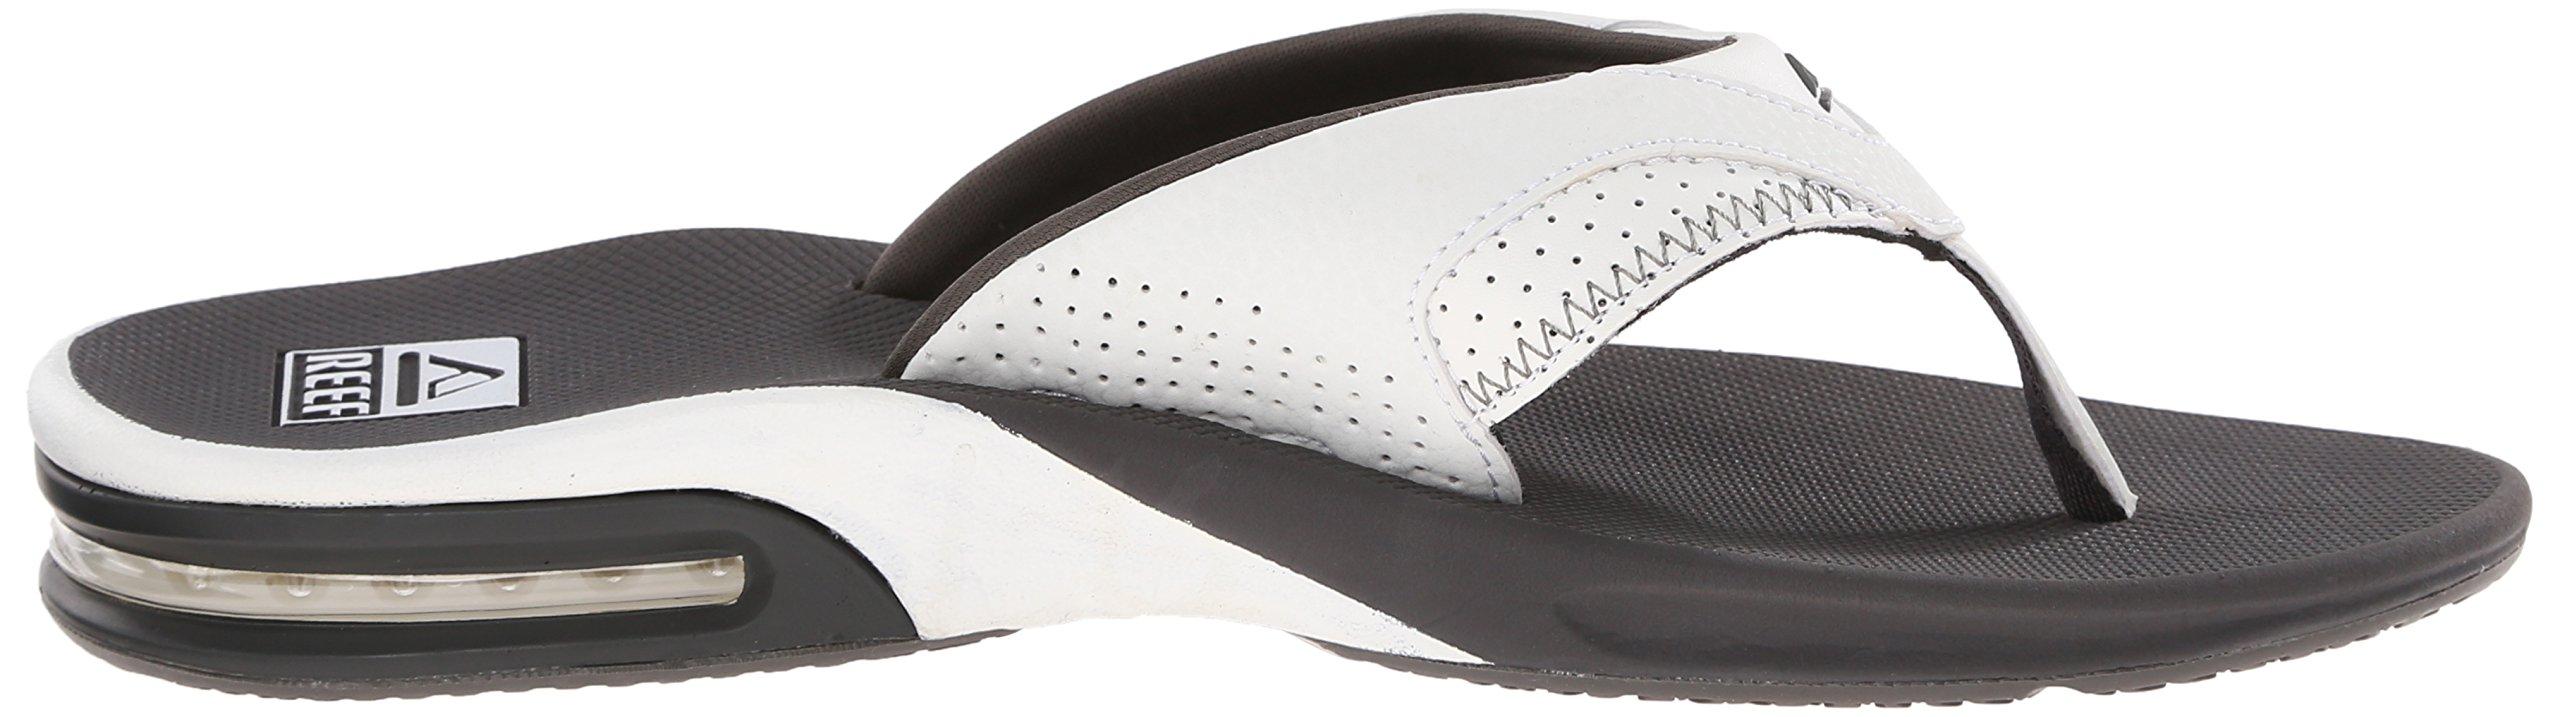 Reef Fanning Mens Sandals  Bottle Opener Flip Flops For Men,GREY/WHITE,7 M US by Reef (Image #8)